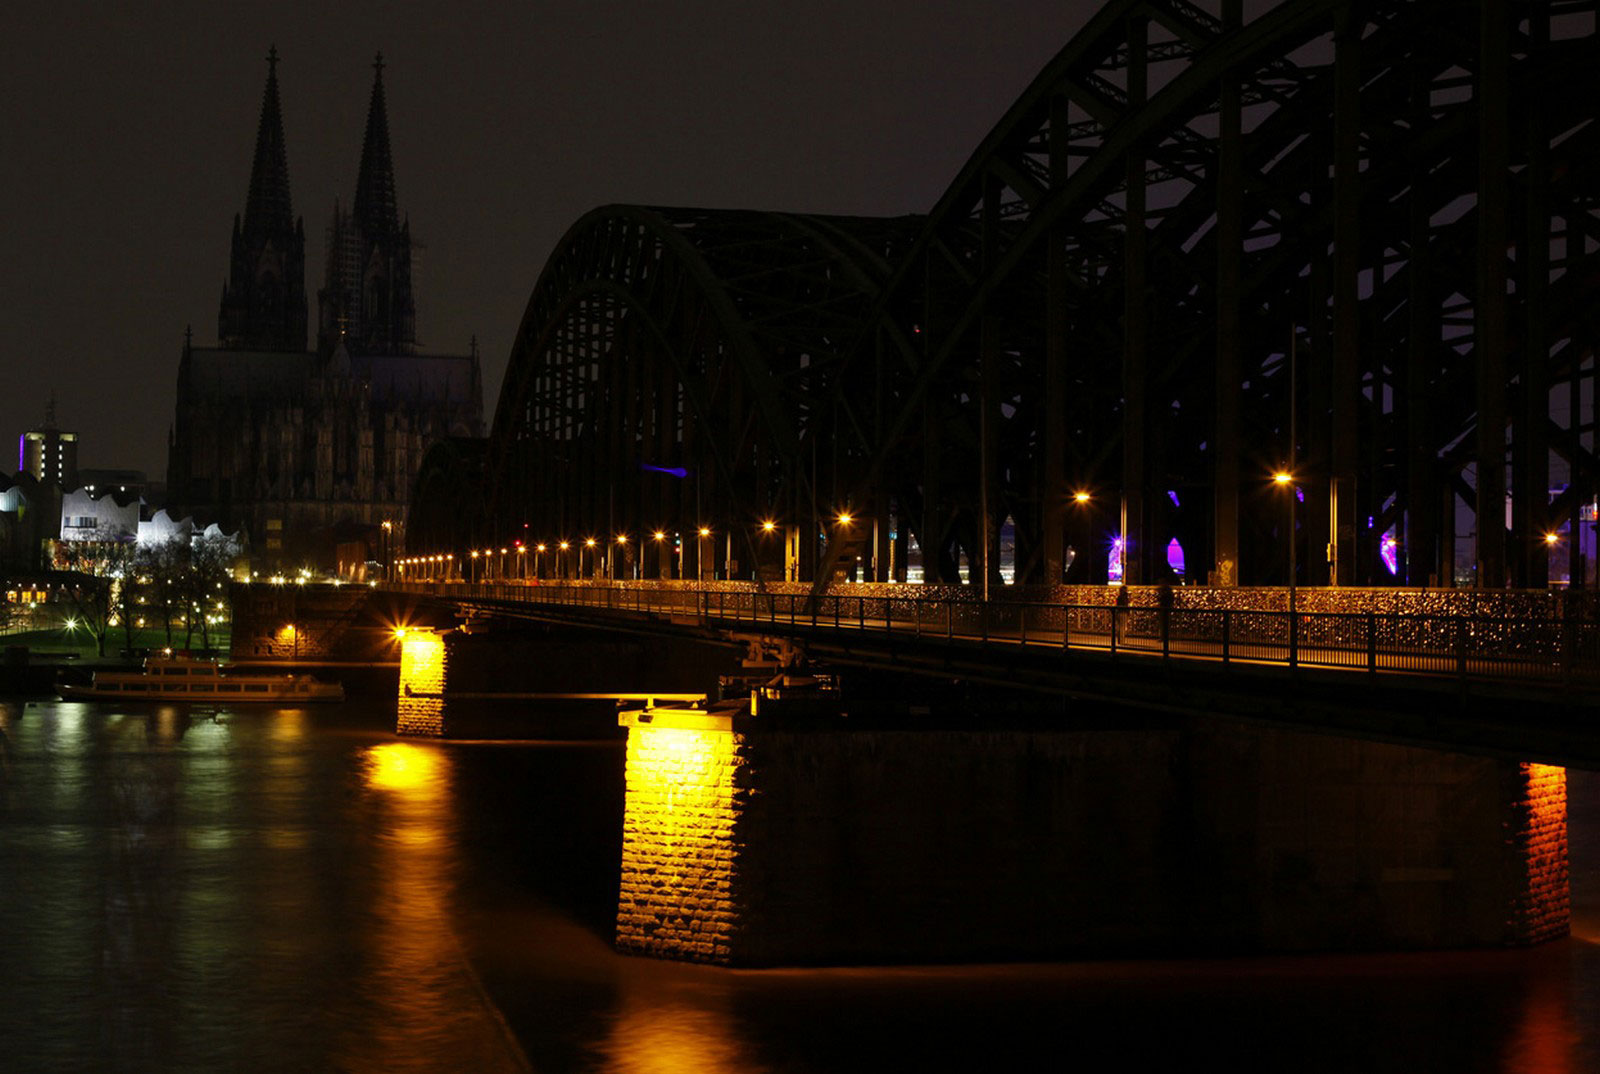 Мост Гогенцоллернов, снимок